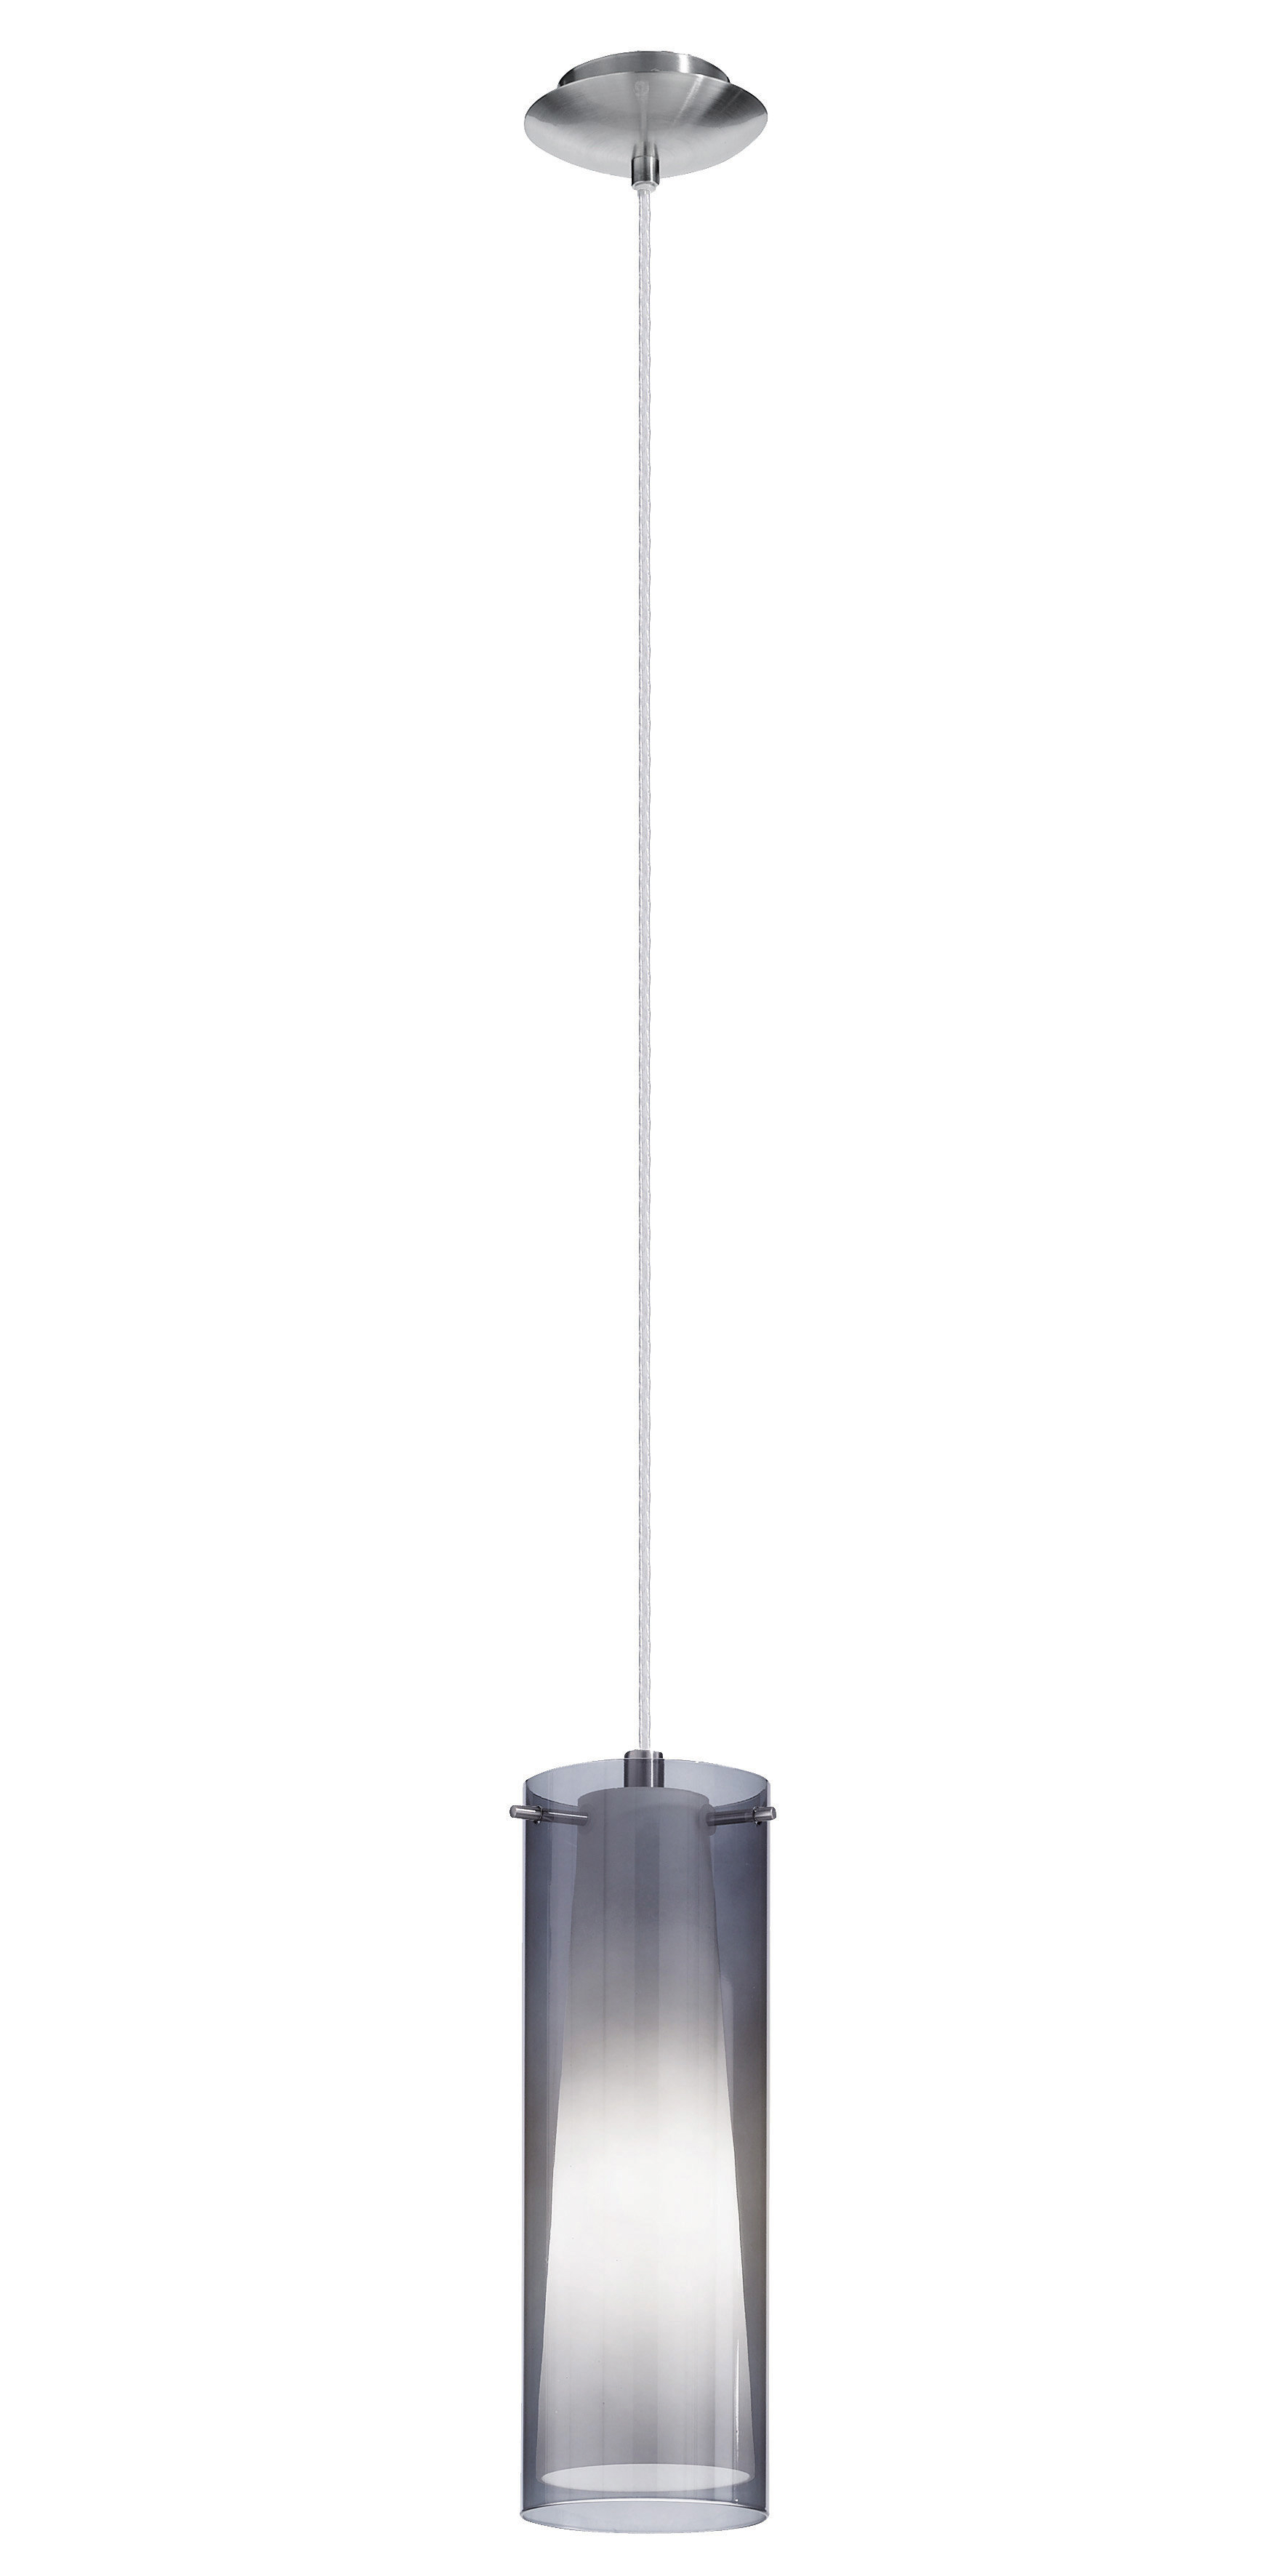 Julia 1-Light Single Cylinder Pendant regarding Bainbridge 1-Light Single Cylinder Pendants (Image 15 of 30)